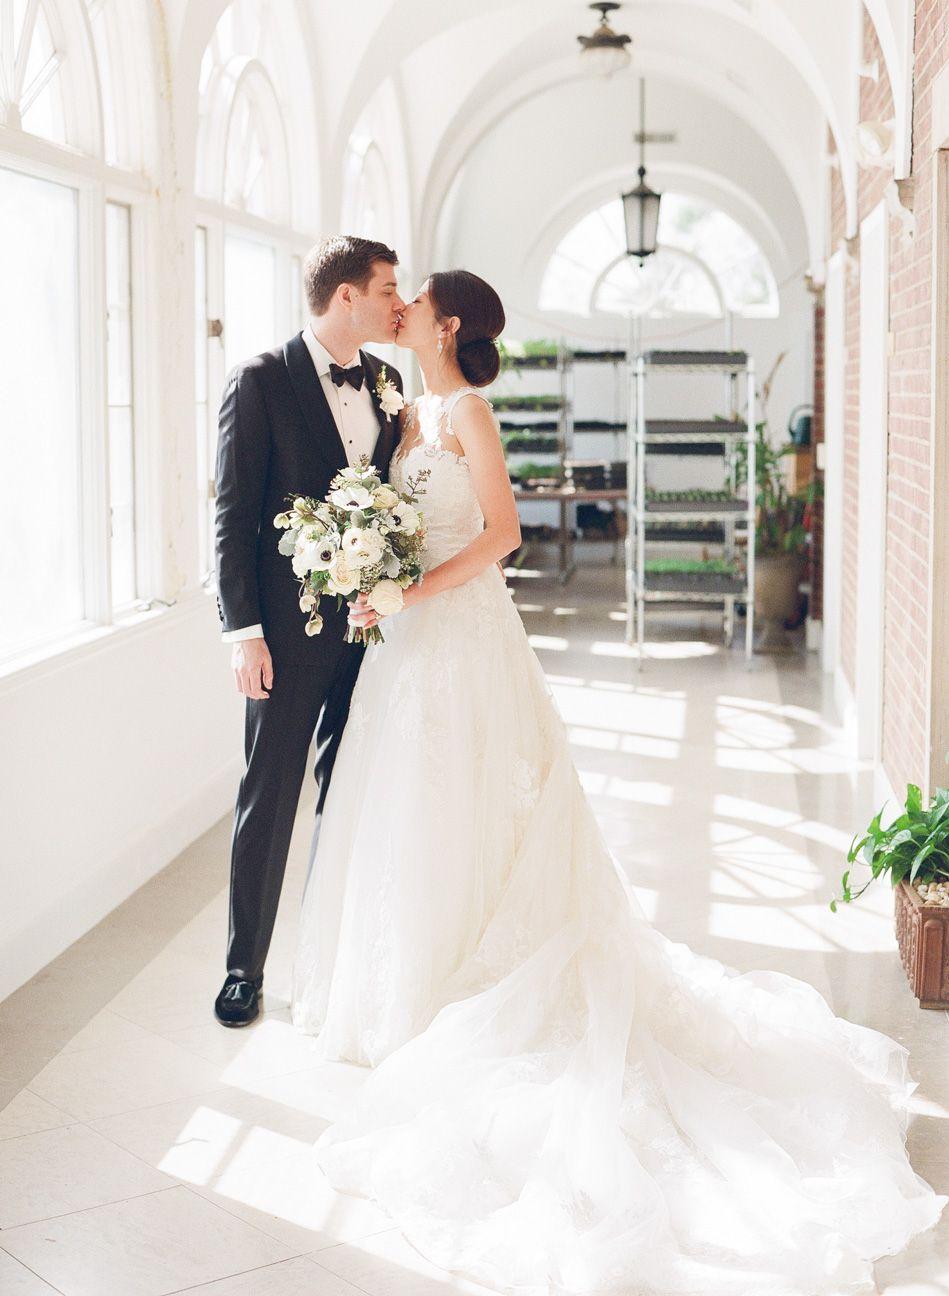 KarenHillPhotography-Zhu-Wedding-0230.jpg